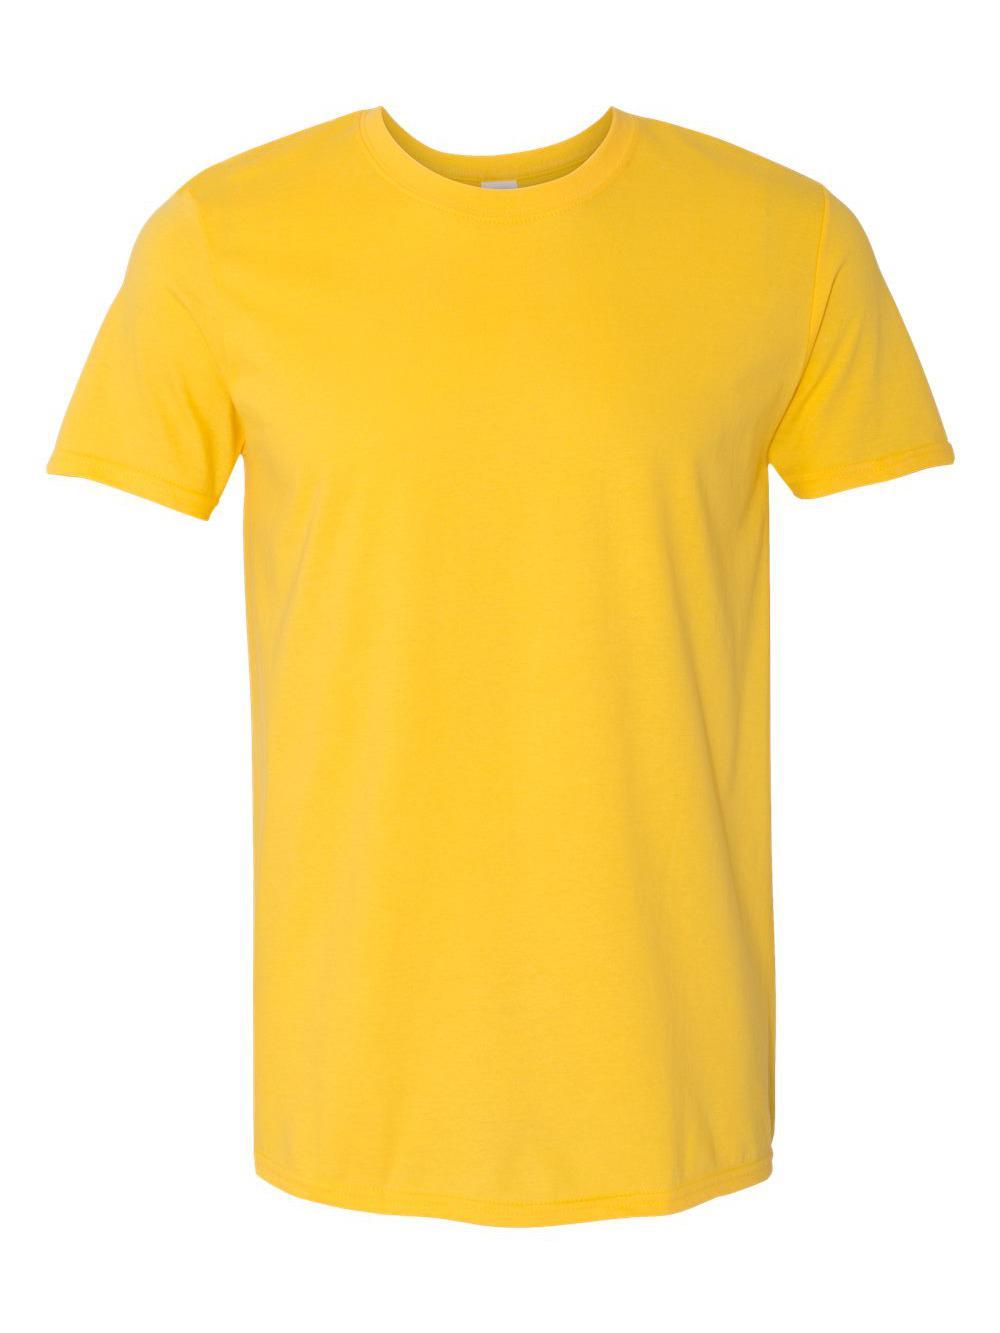 Gildan-Softstyle-T-Shirt-64000 thumbnail 42